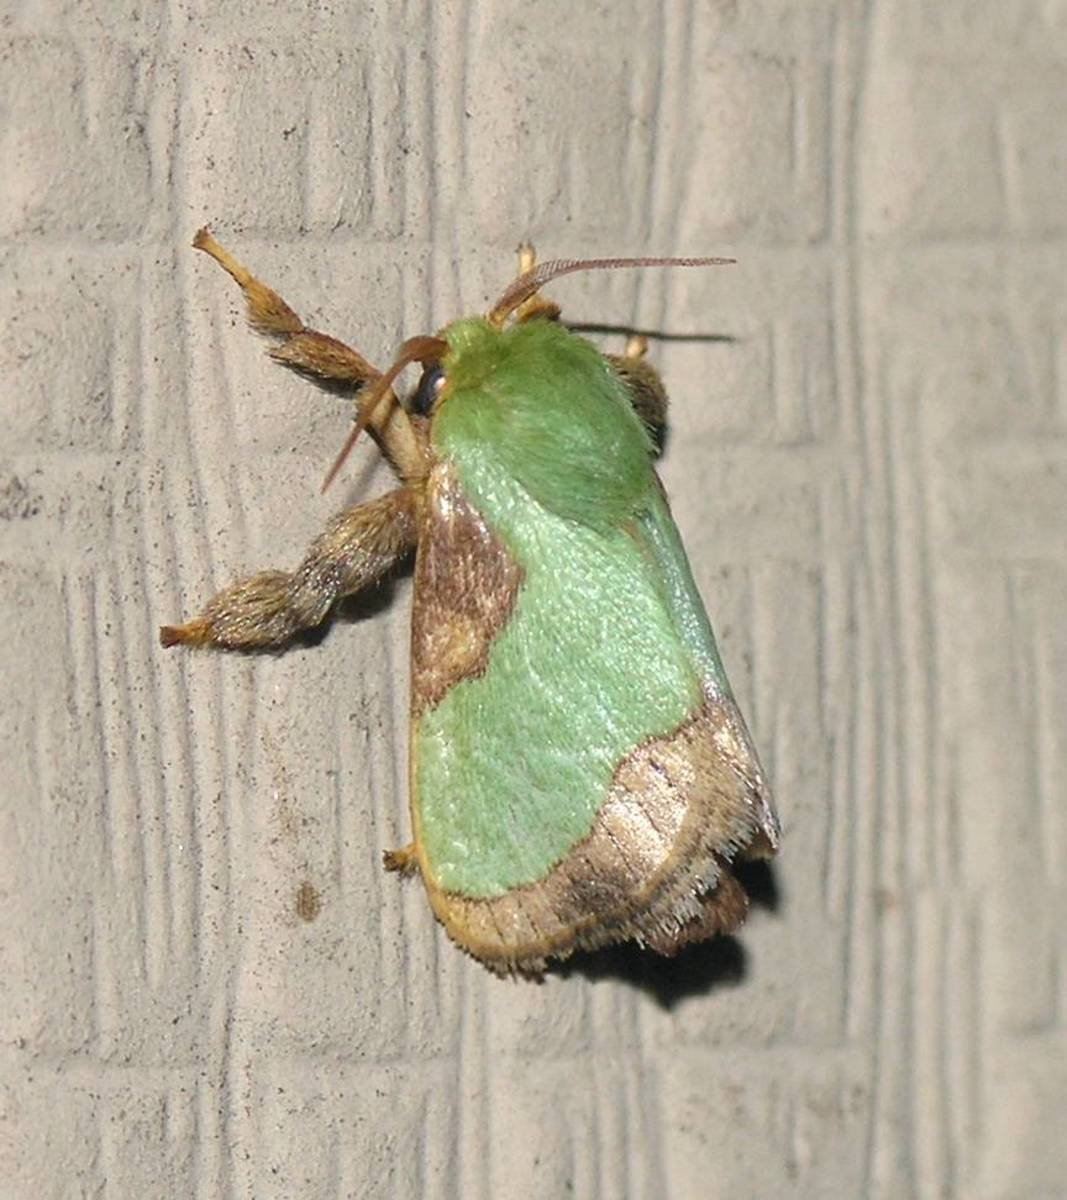 Moth Caterpillar Identification Chart: Stinging Caterpillar Identification And Guide